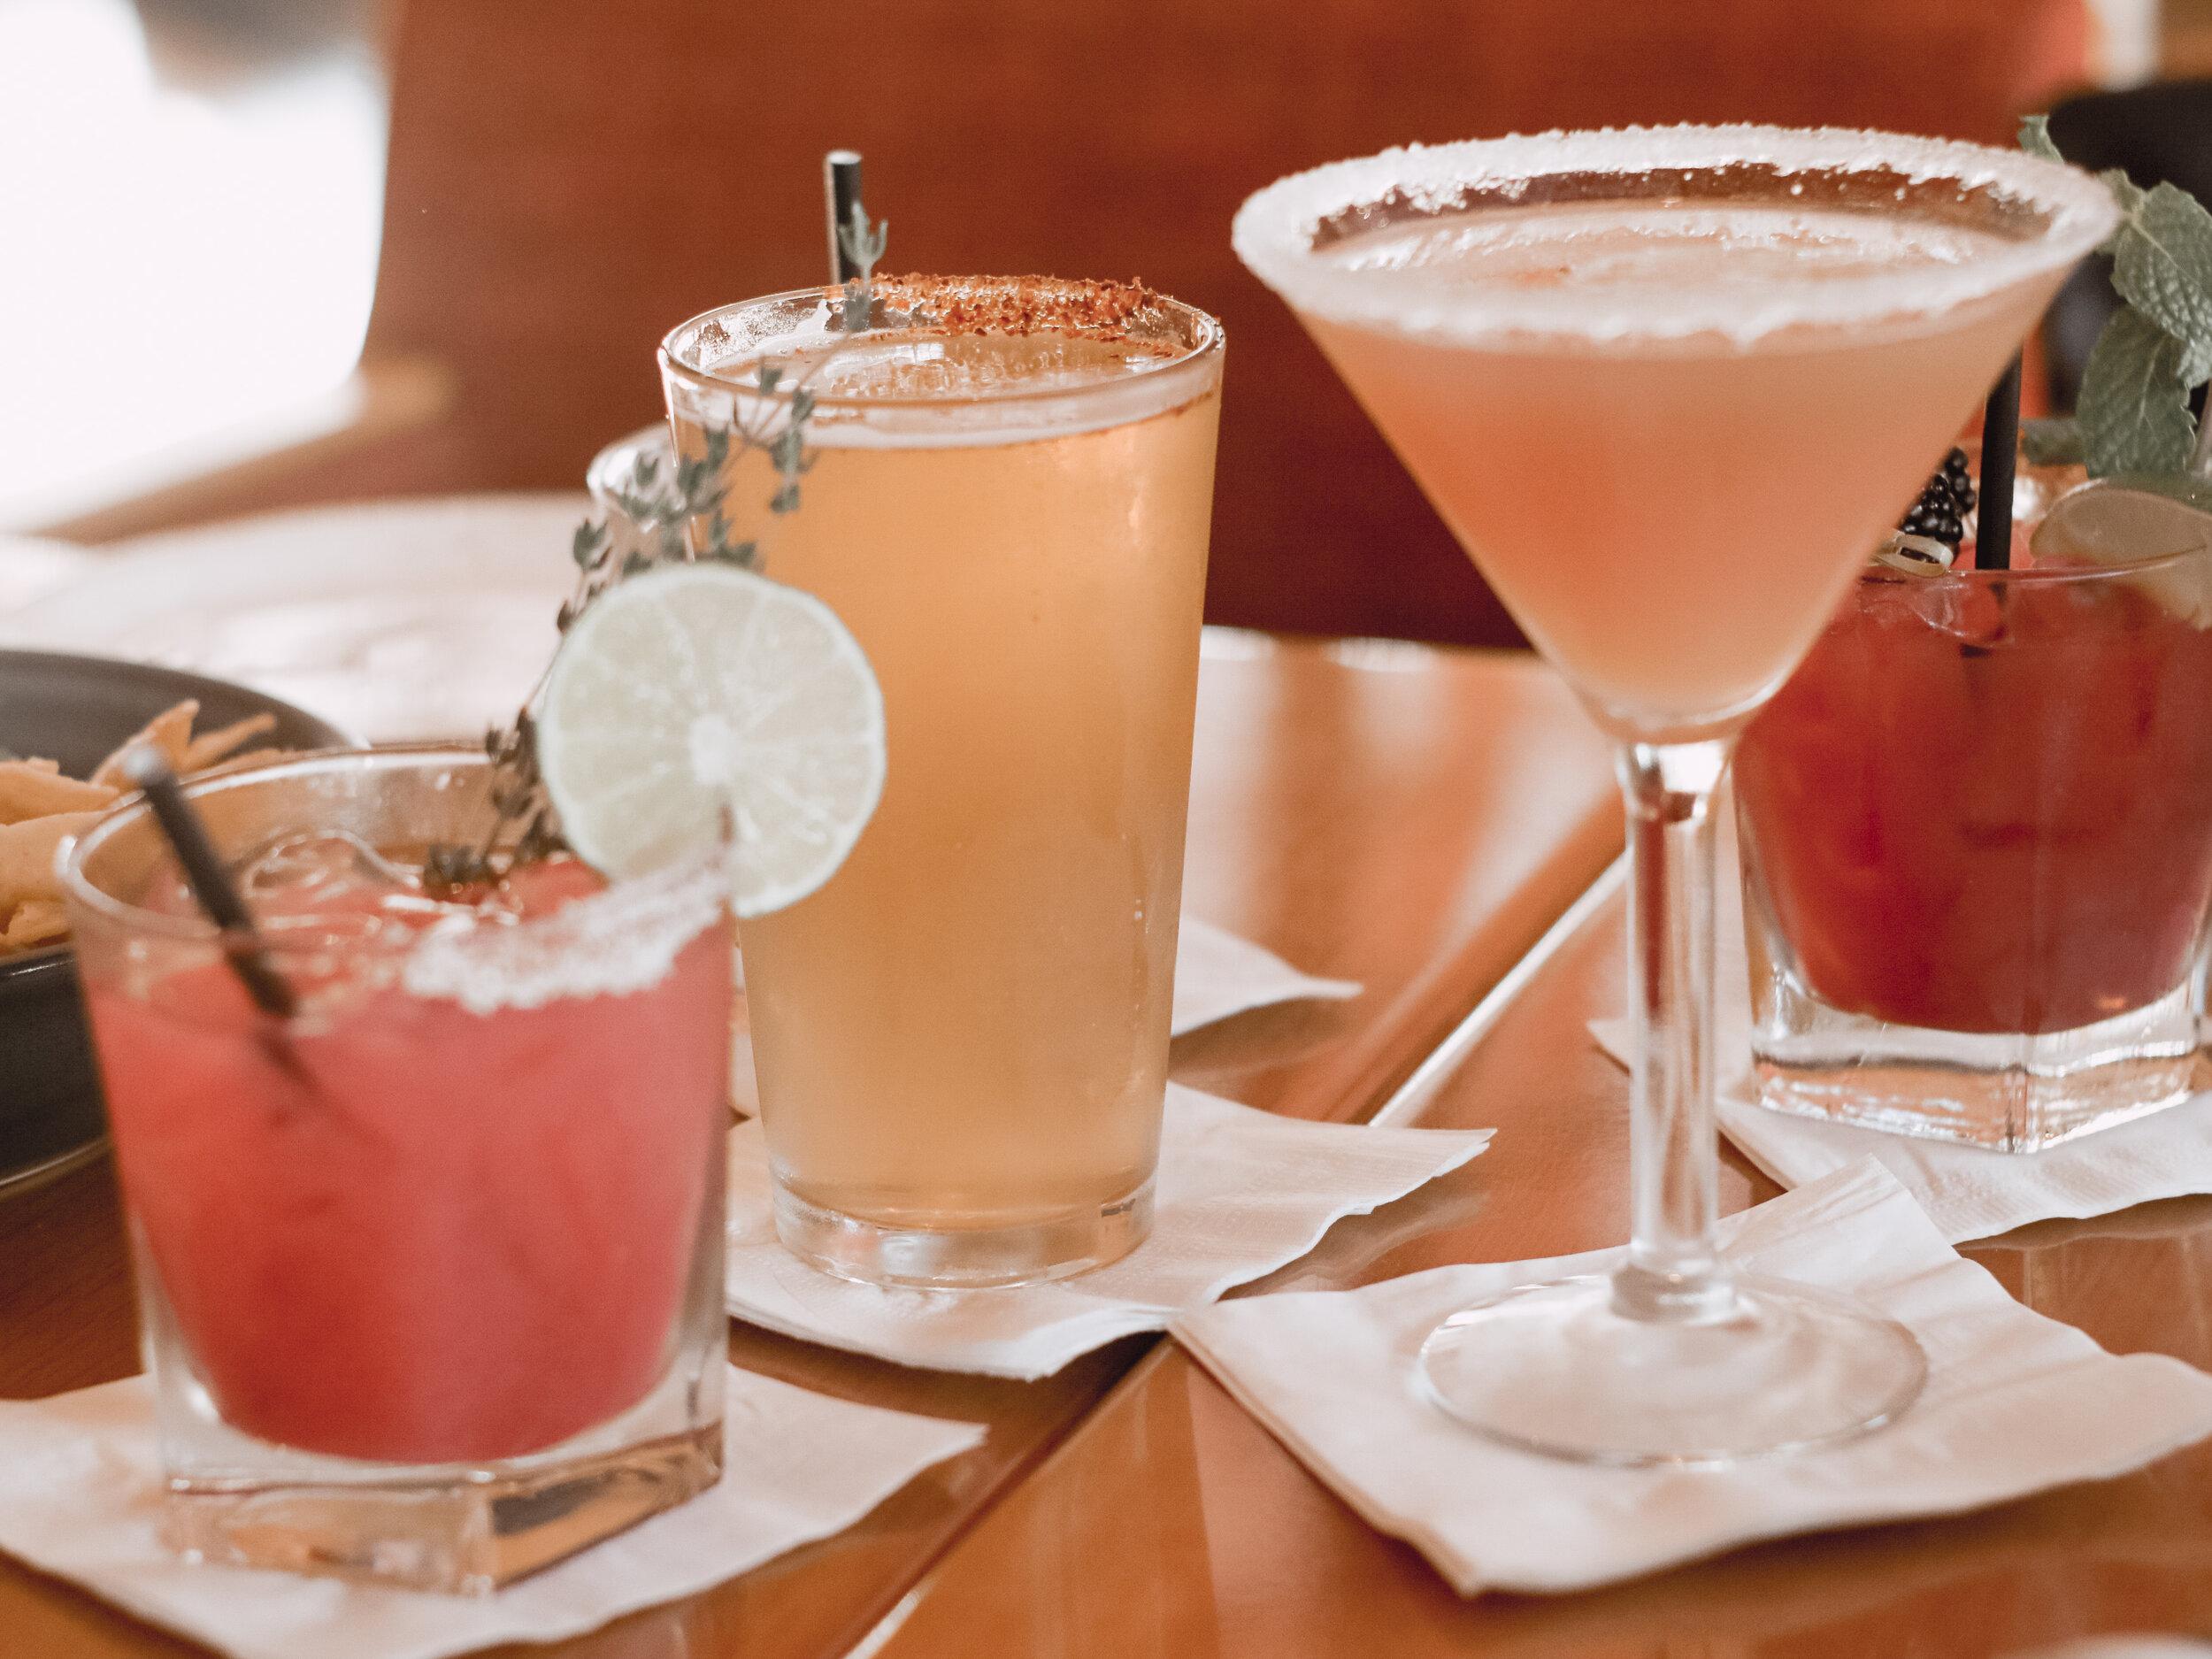 Eats Kitchen & Bar Irvine Cocktails & Beer | AMANDANHAMMOND.COM